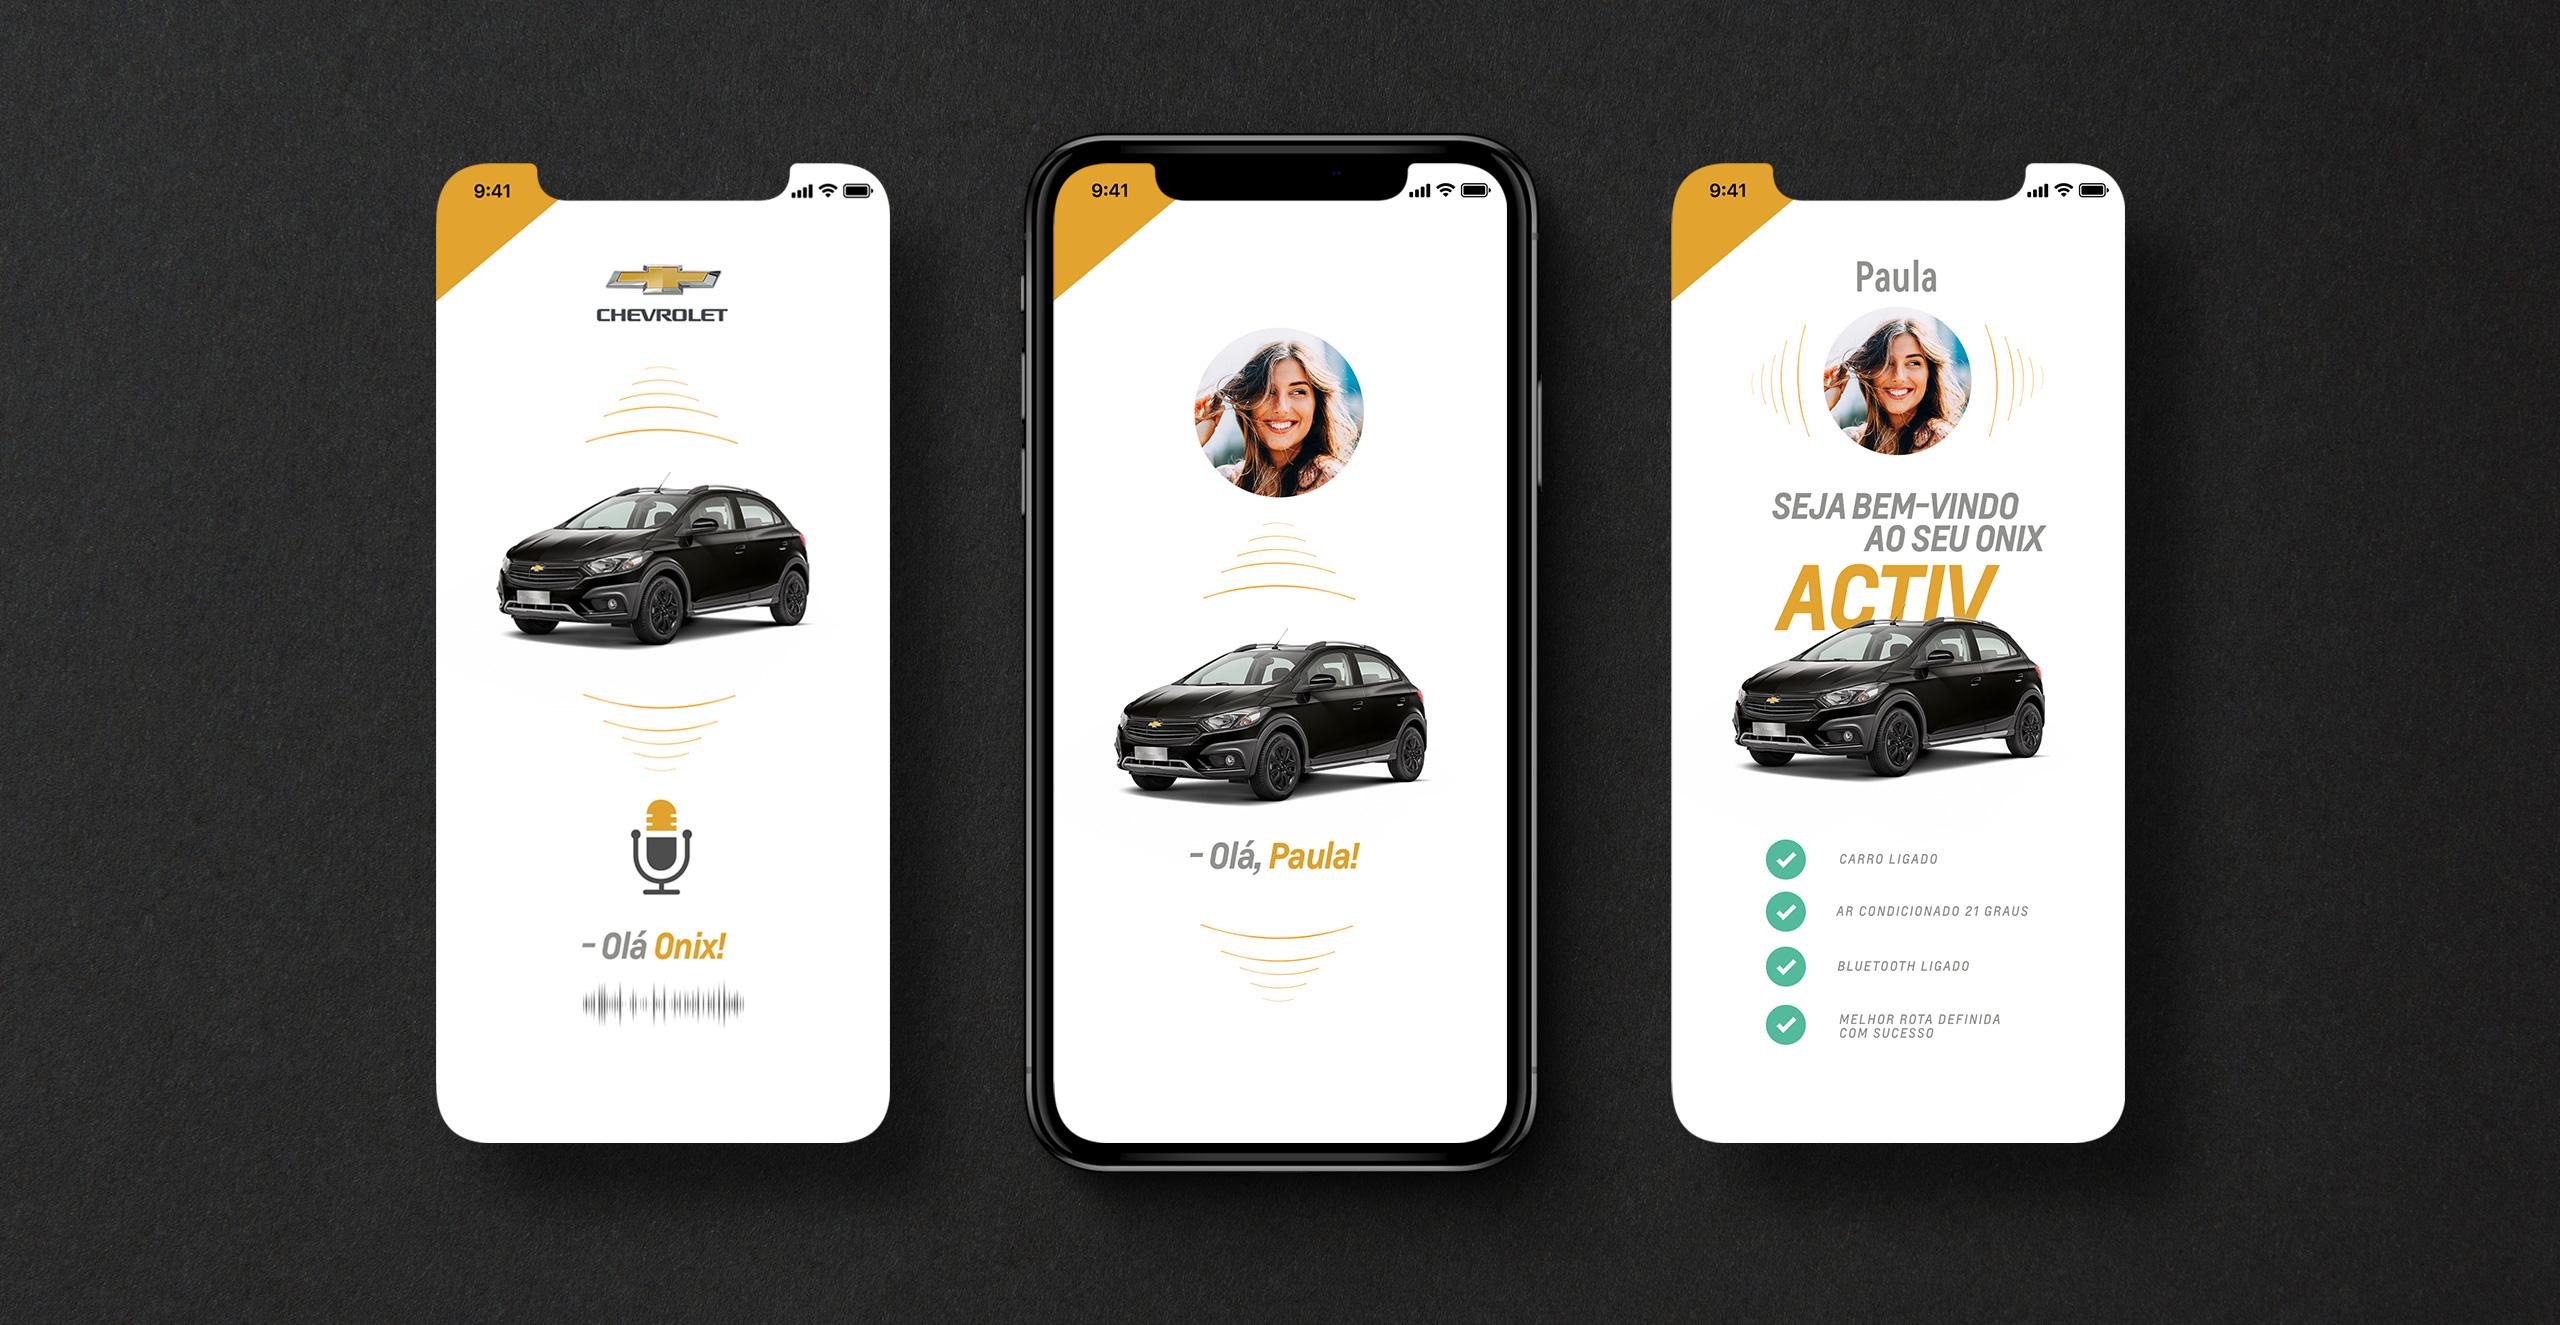 Felipe Espanhol App My Chevrolet